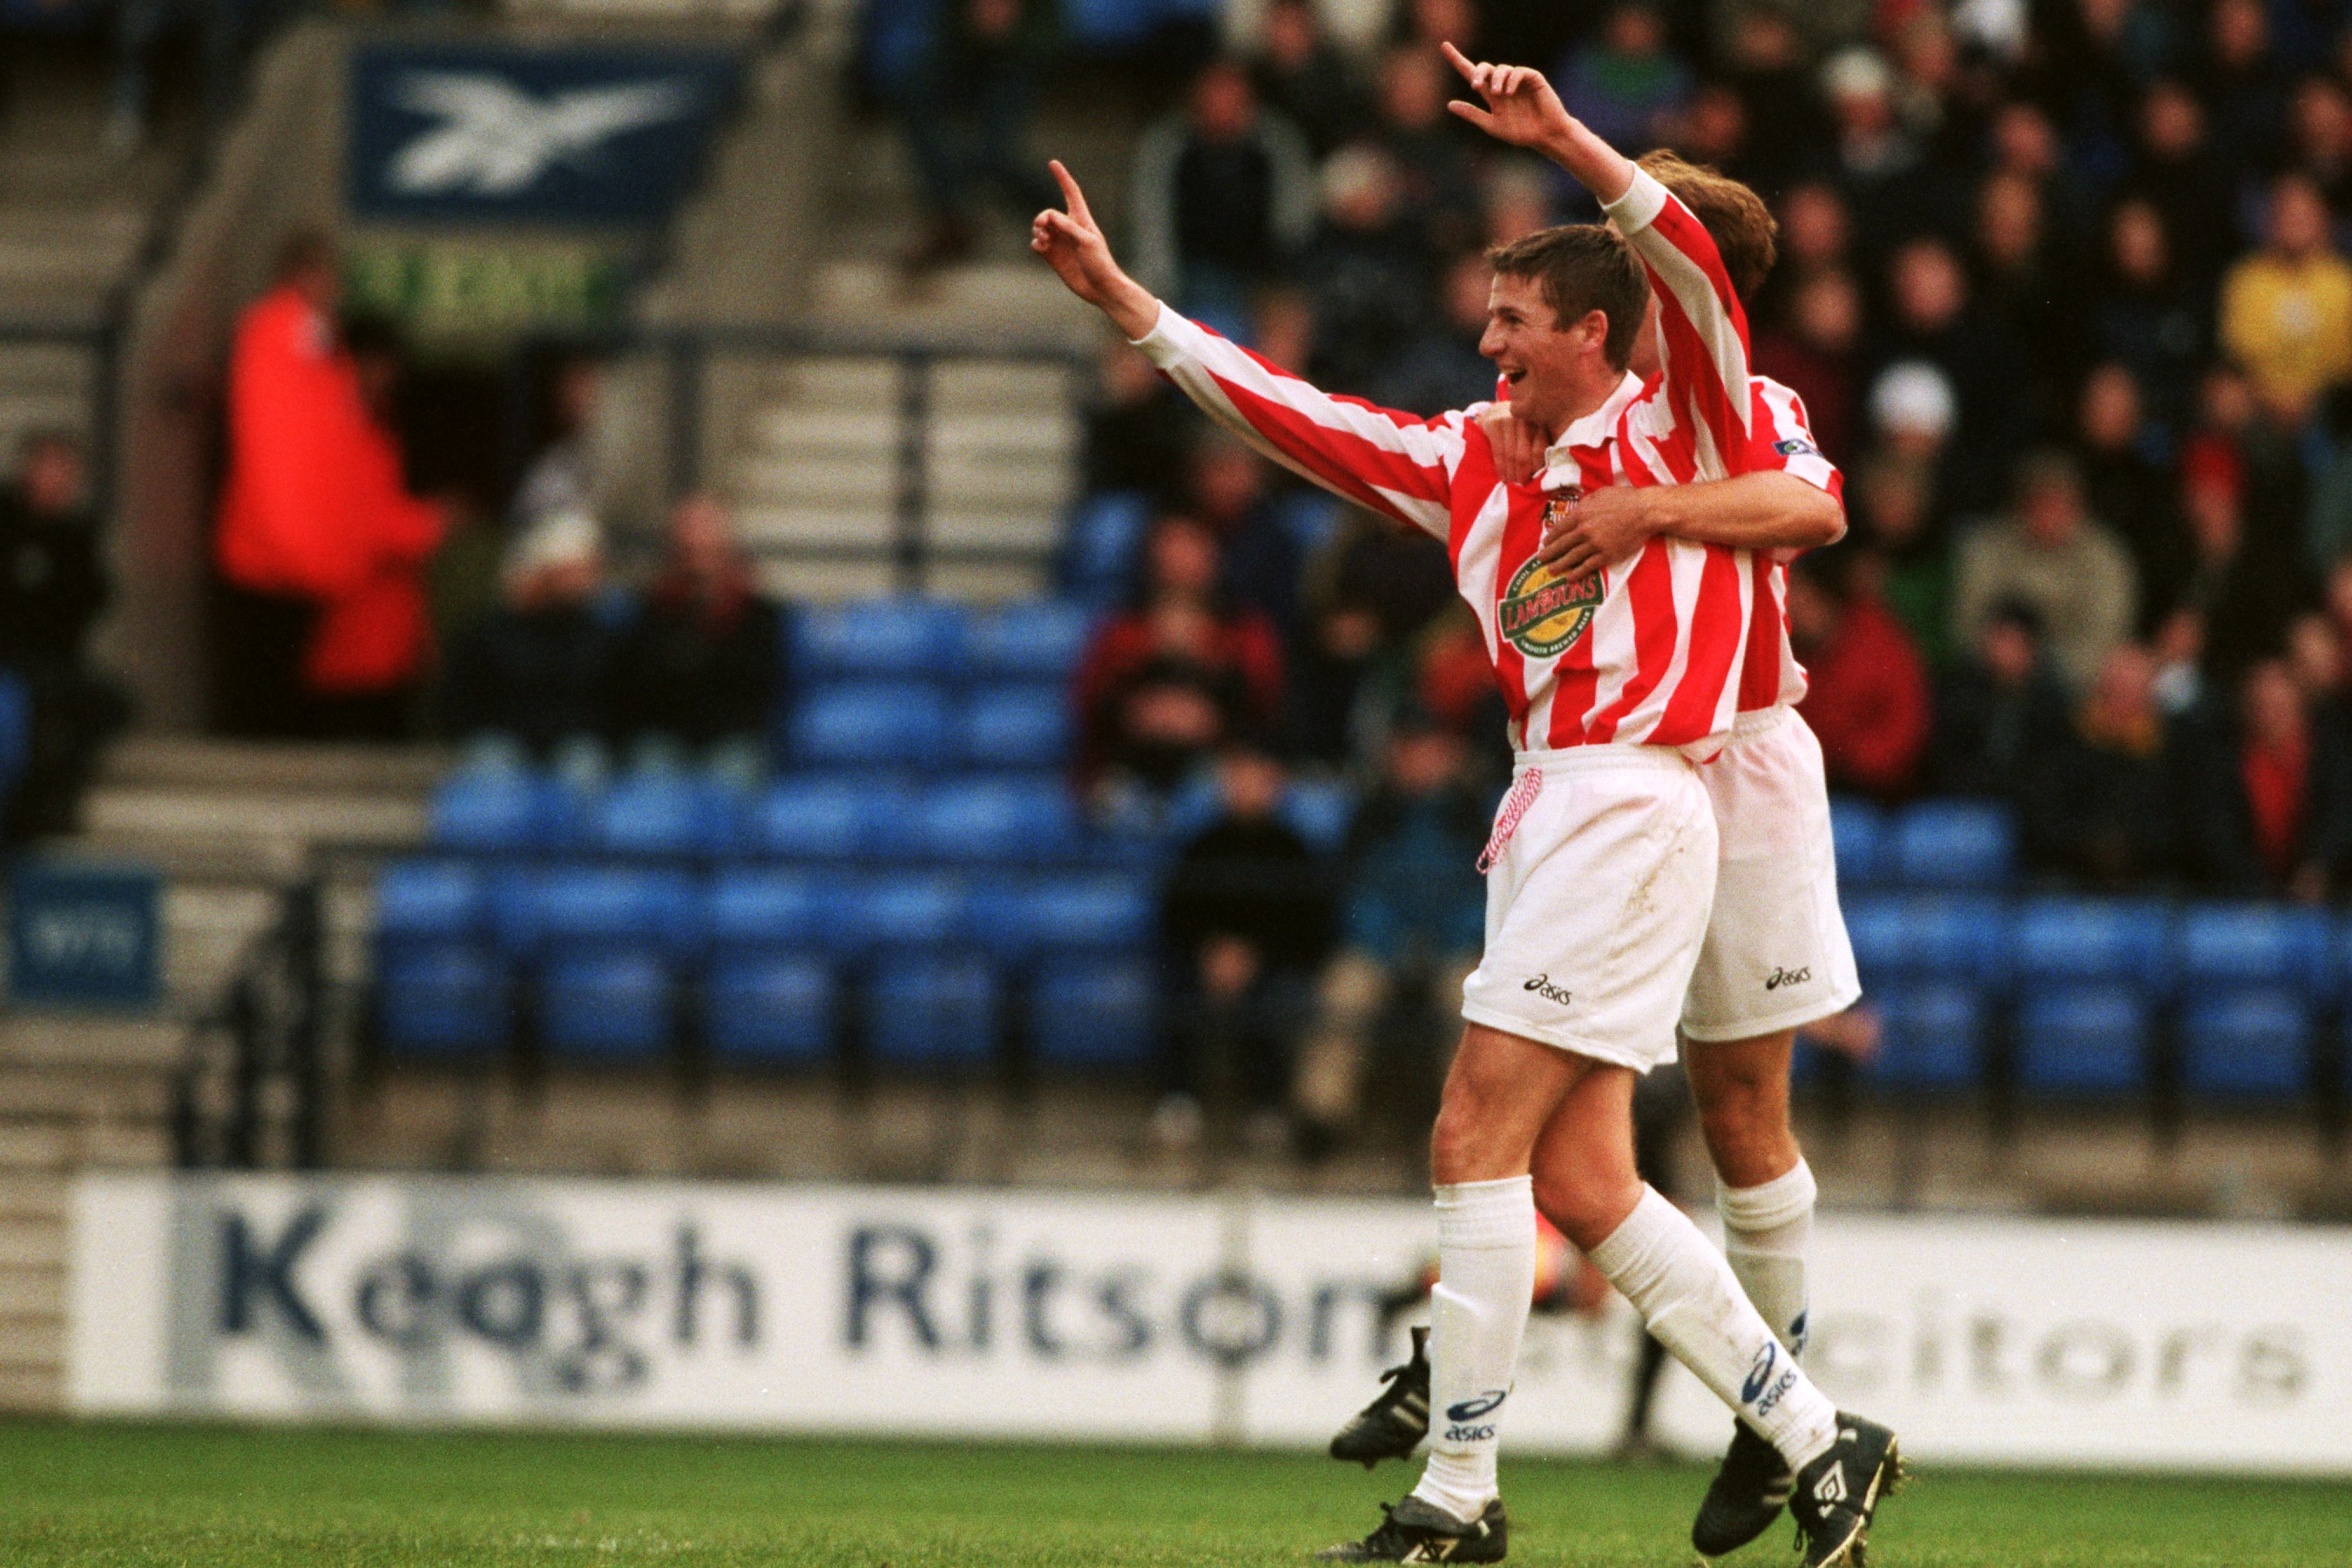 Soccer - Nationwide League Division One - Bolton Wanderers v Sunderland